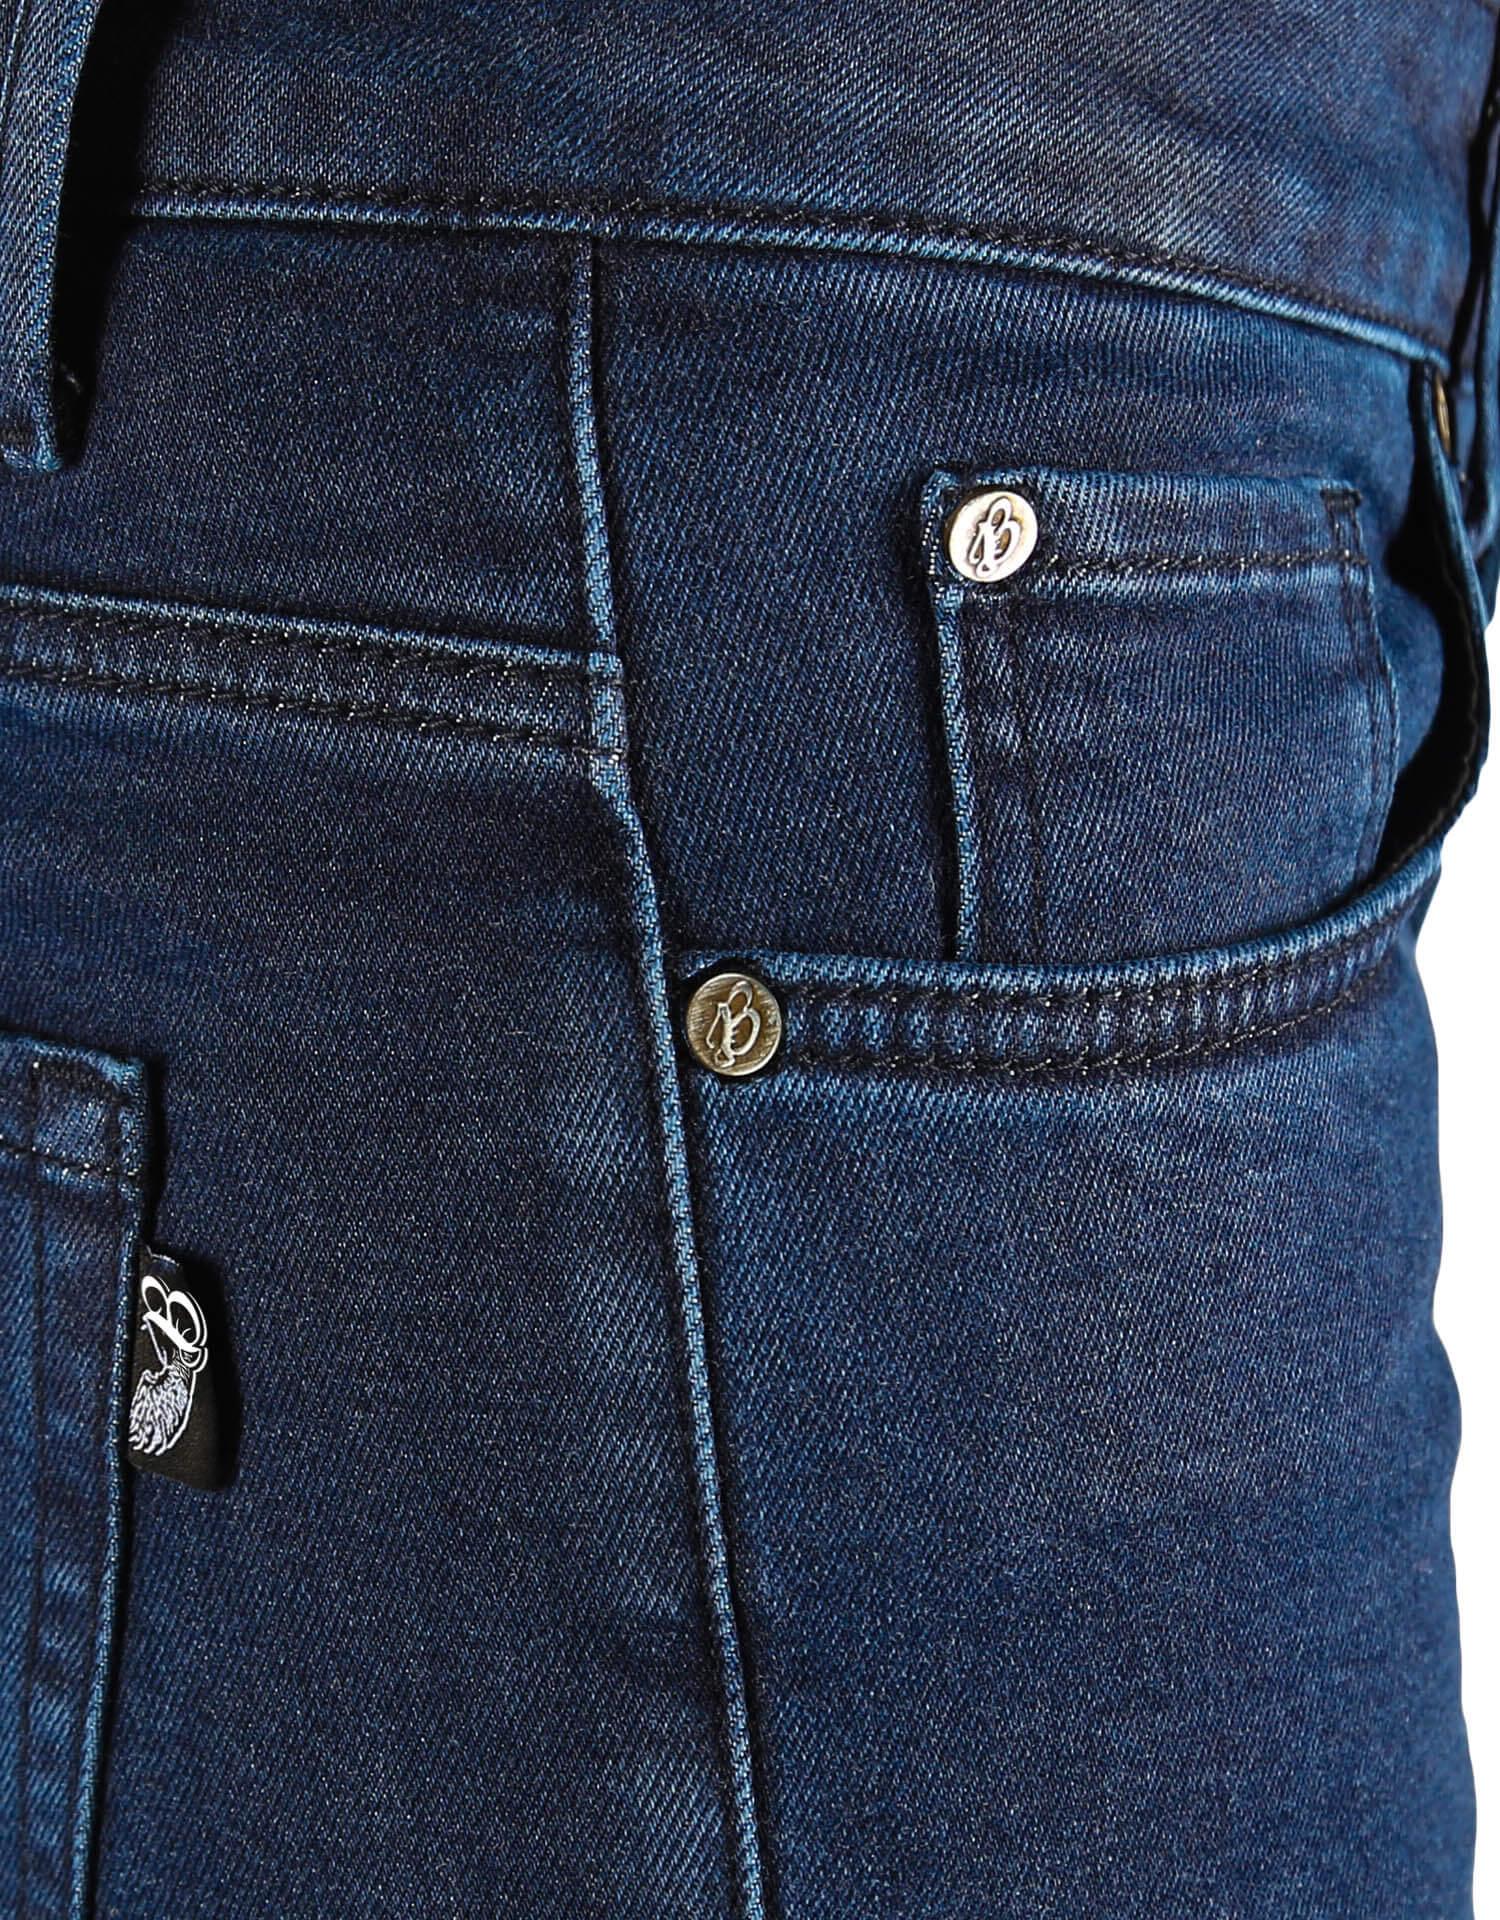 Urbanizer Dark Blue Cordura® Korumalı Motosiklet Kot Pantolonu - Thumbnail